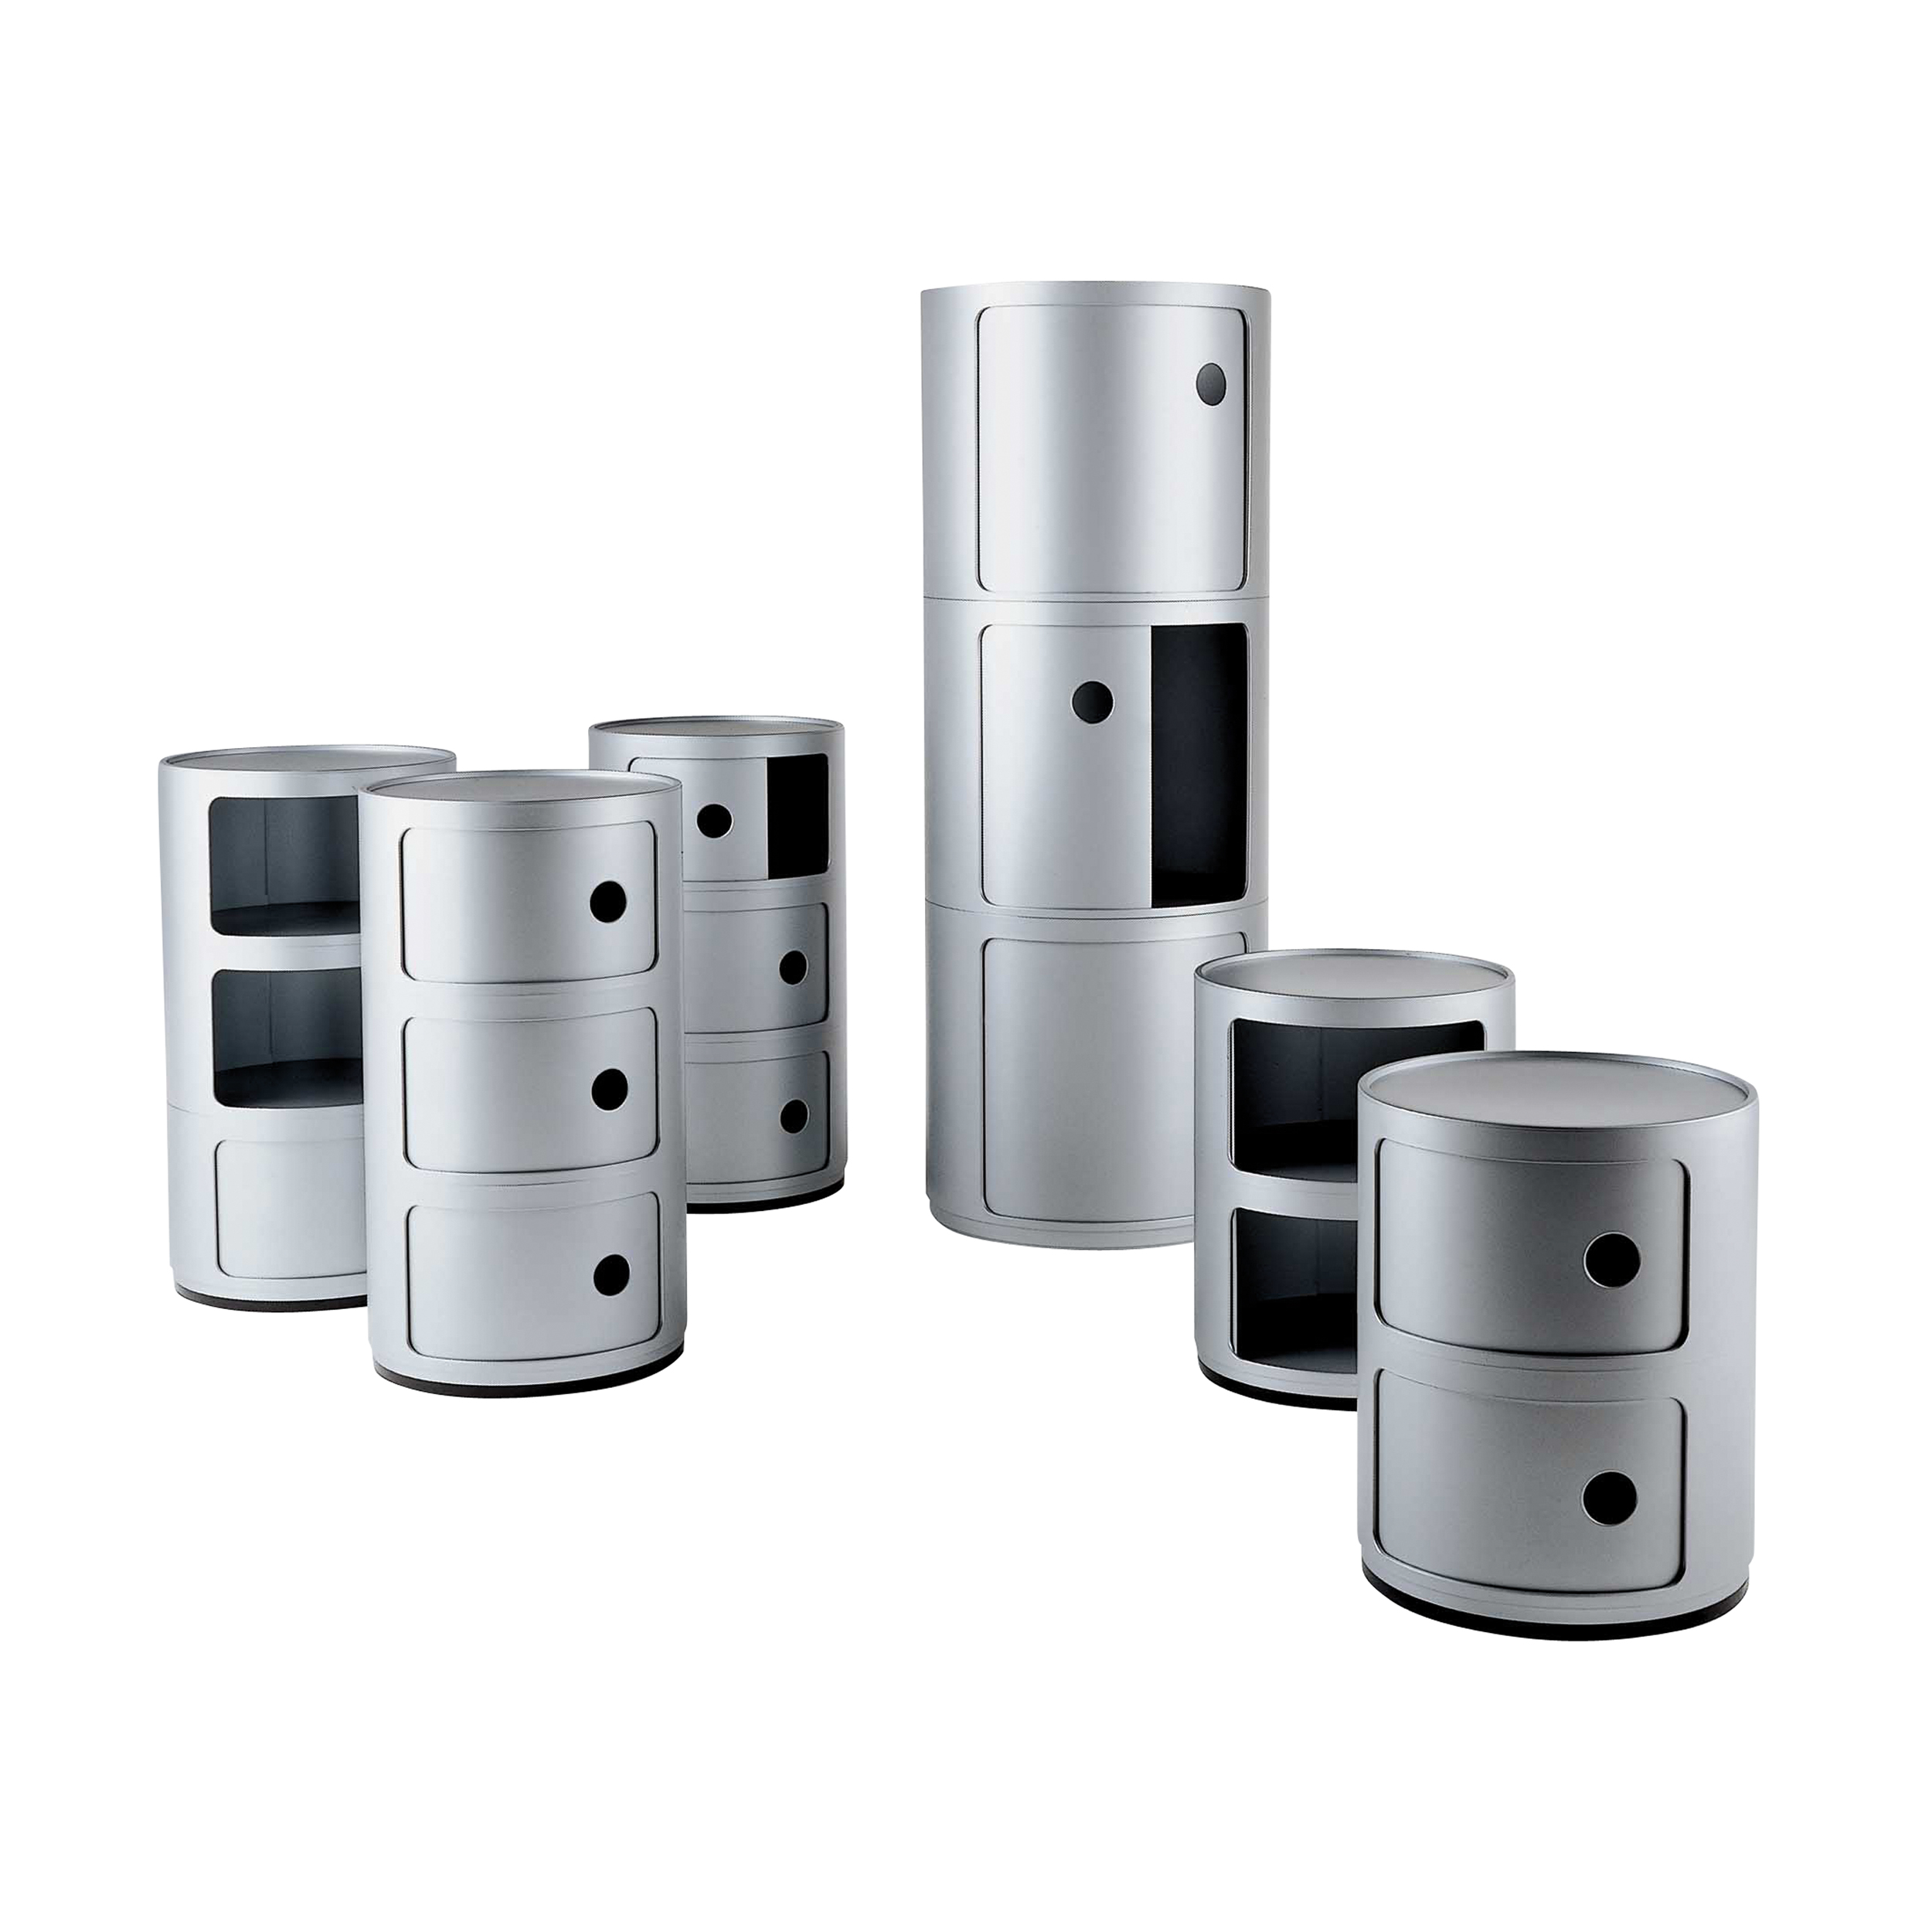 Componibili Containermöbel 3 Elemente